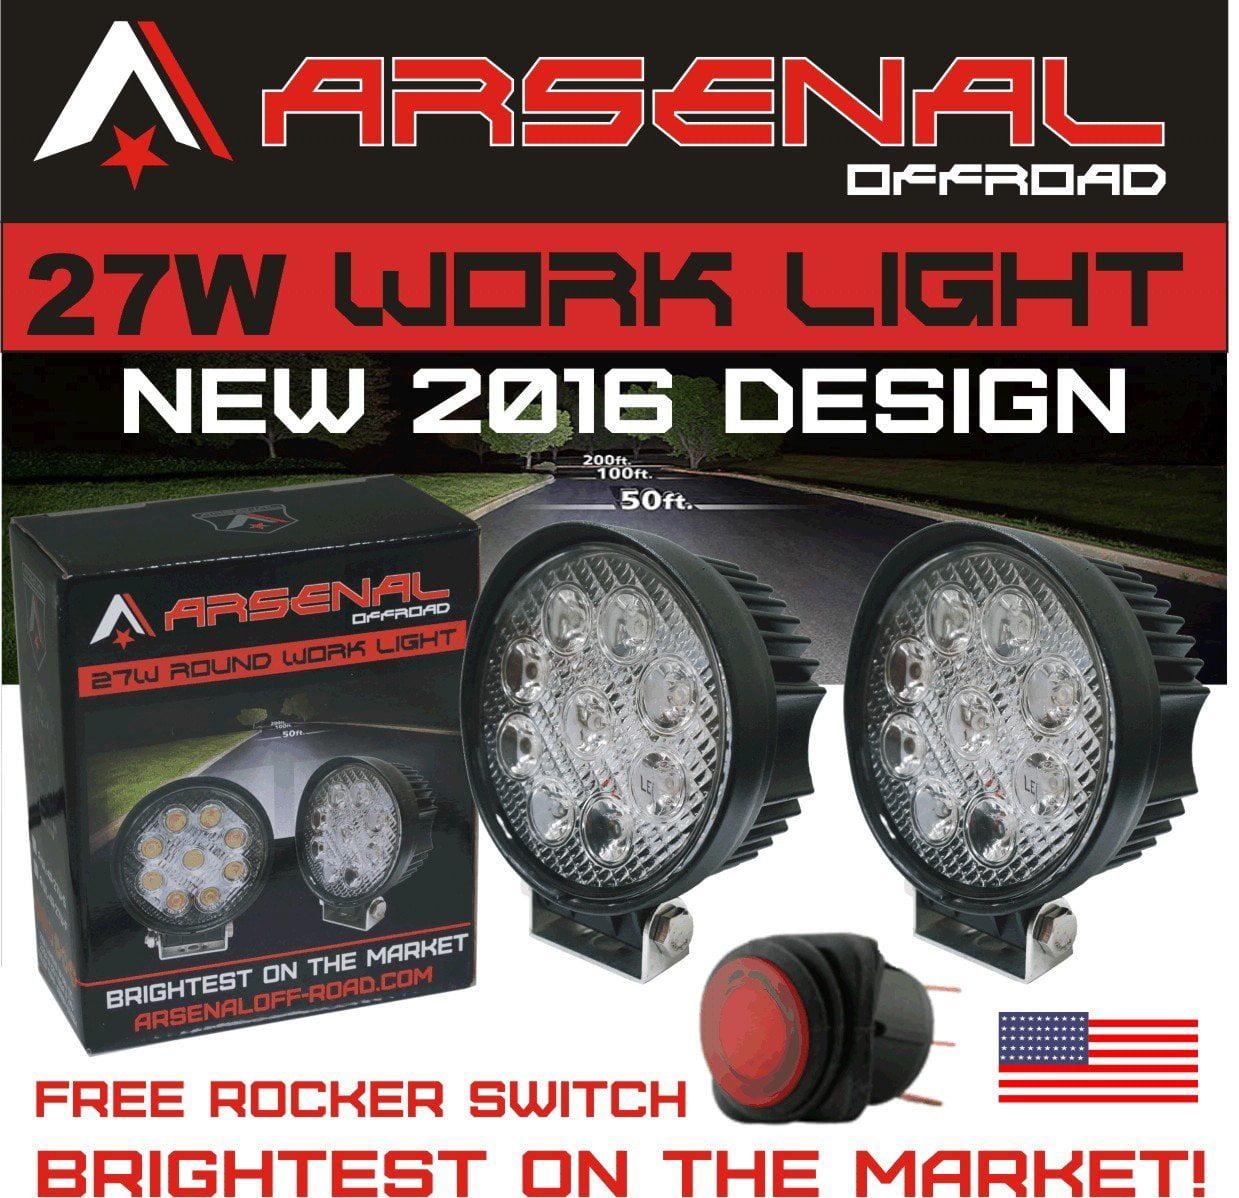 "#1 27w 4"" Round LED Pencil Beam Spot light Arsenal Offroa..."